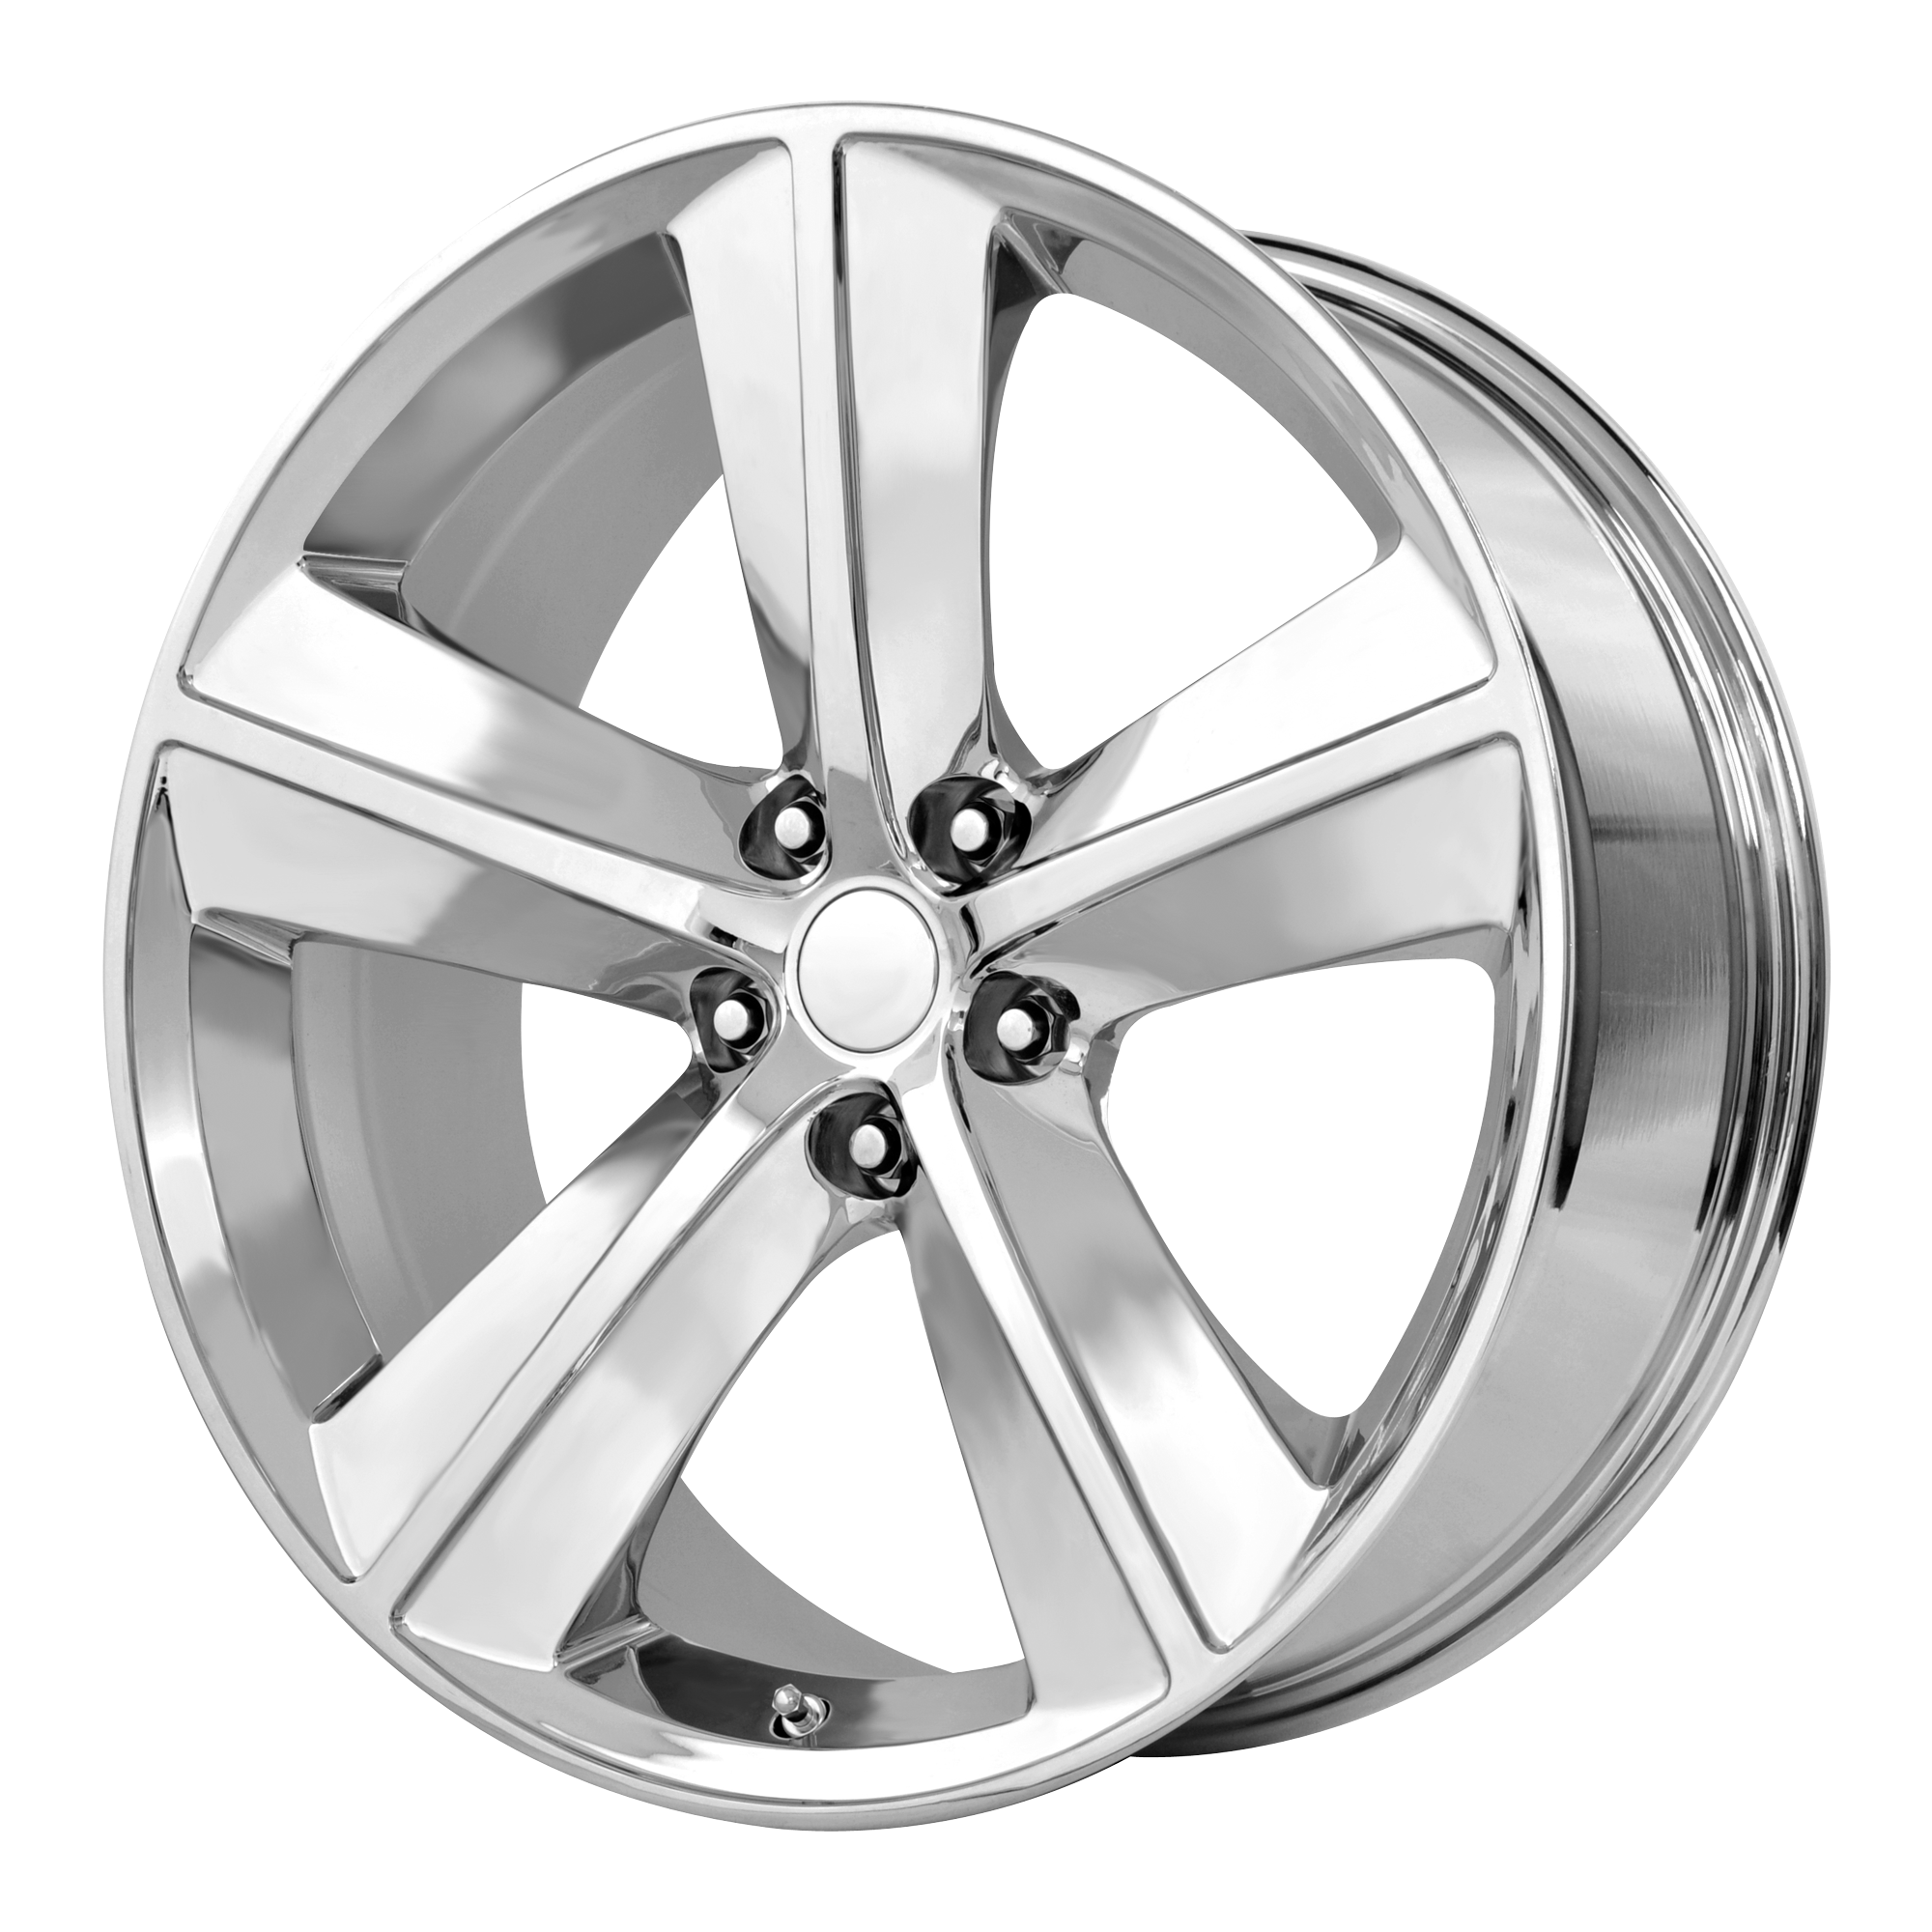 OE Creations Replica Wheels OE Creations 123C Chrome